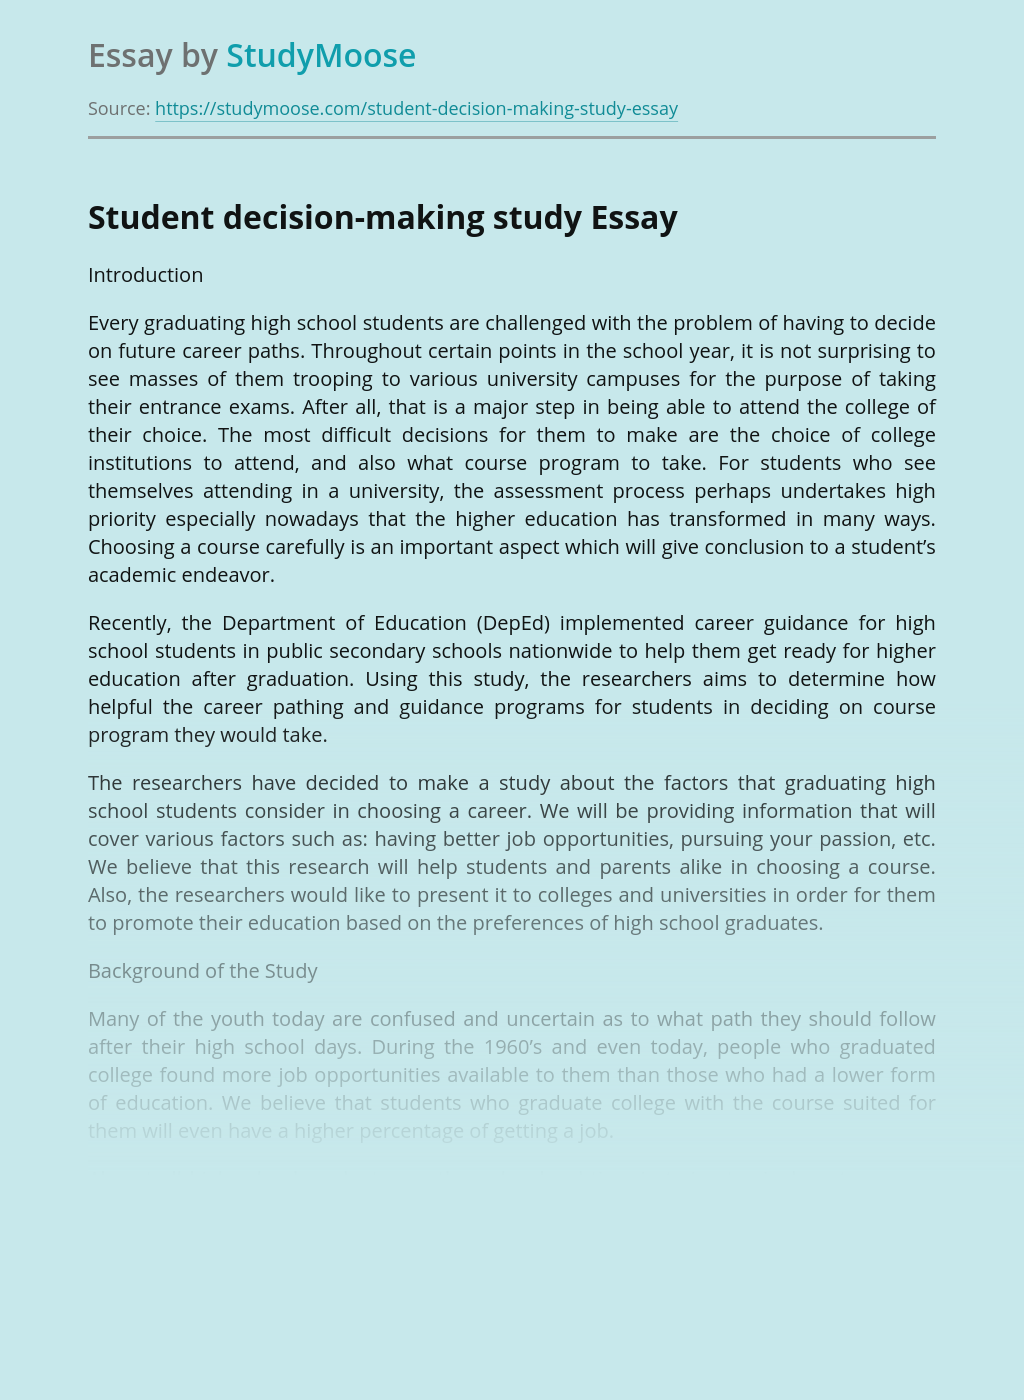 Student decision-making study